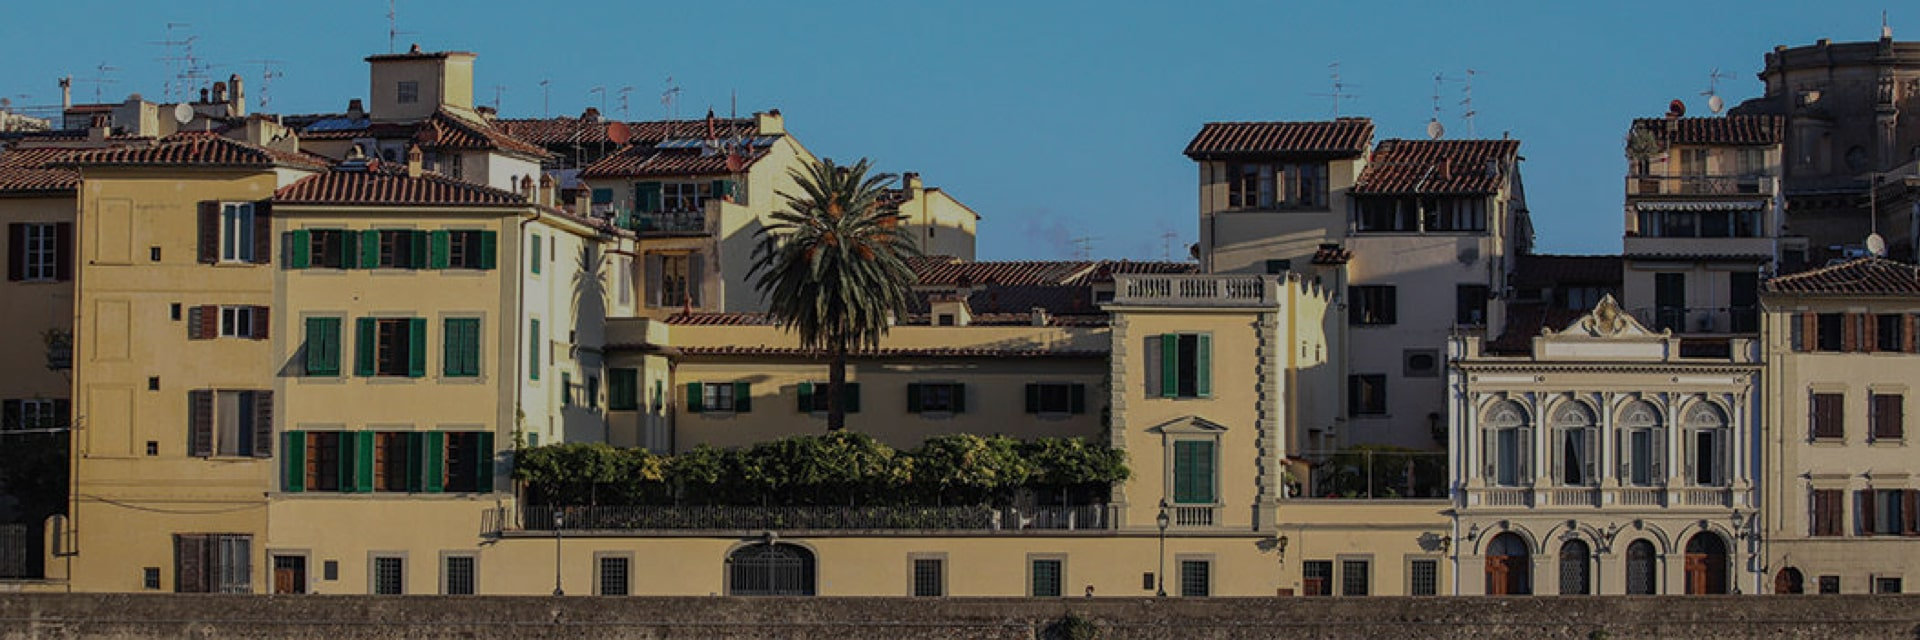 Florence University of the Arts